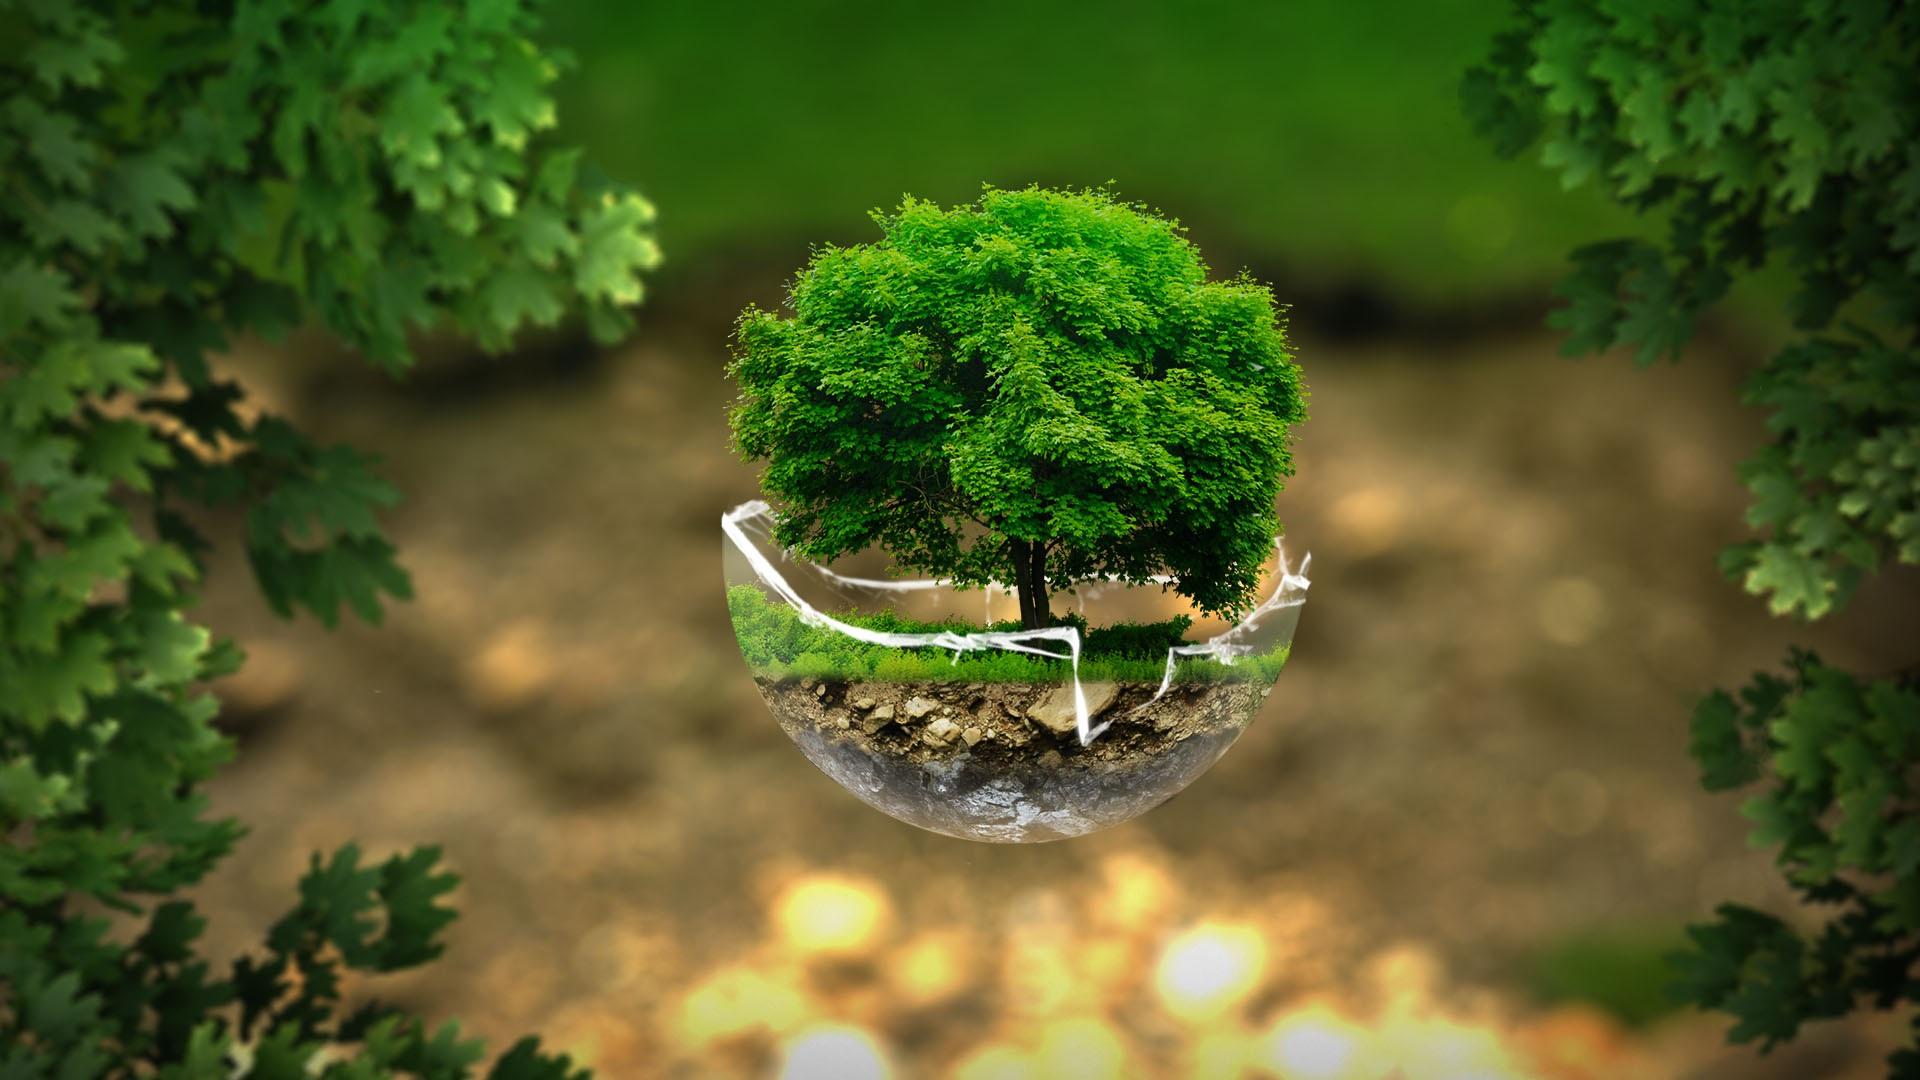 10. Green fest: Budućnost je na zemlji!